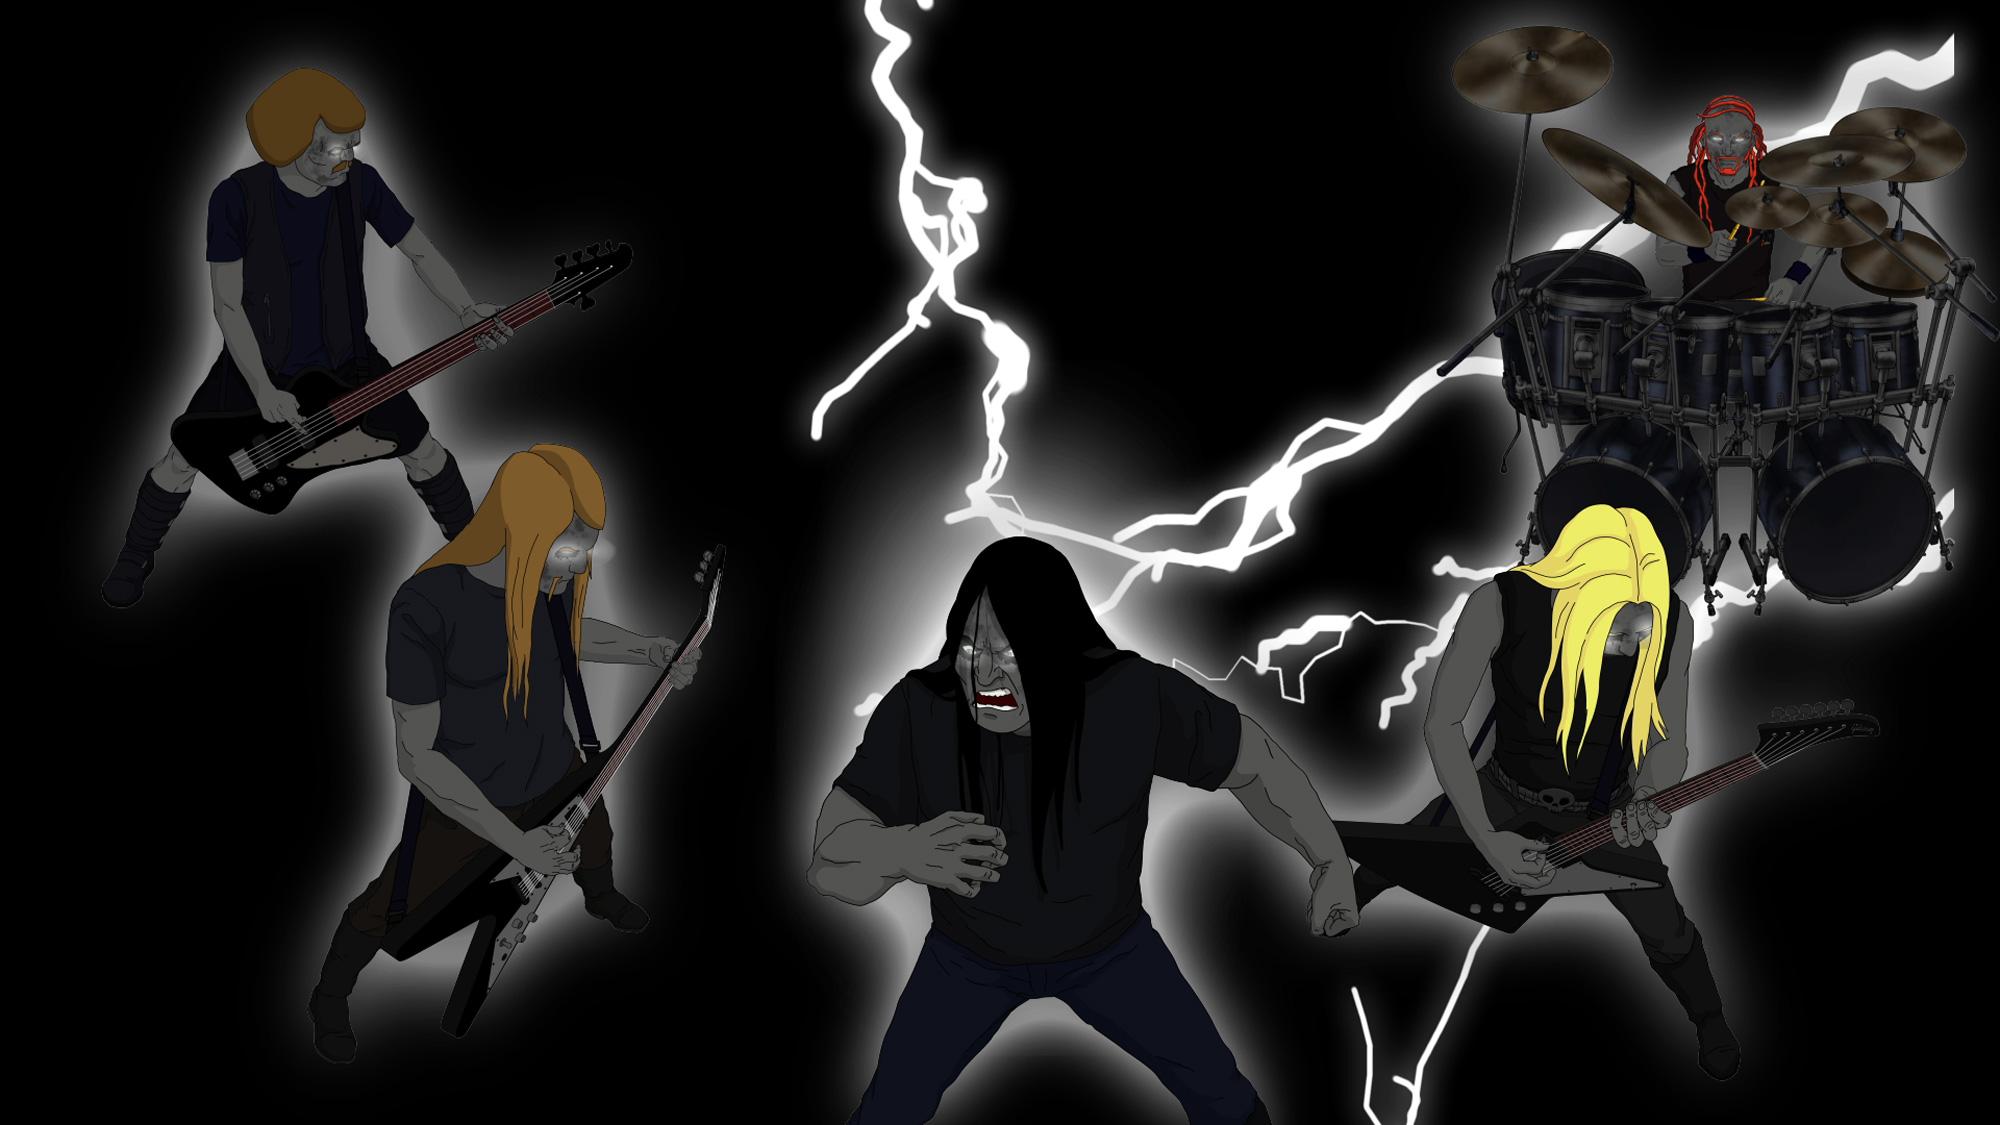 Dethklok heavy metal music cartoons hard rock band groups 2000x1125